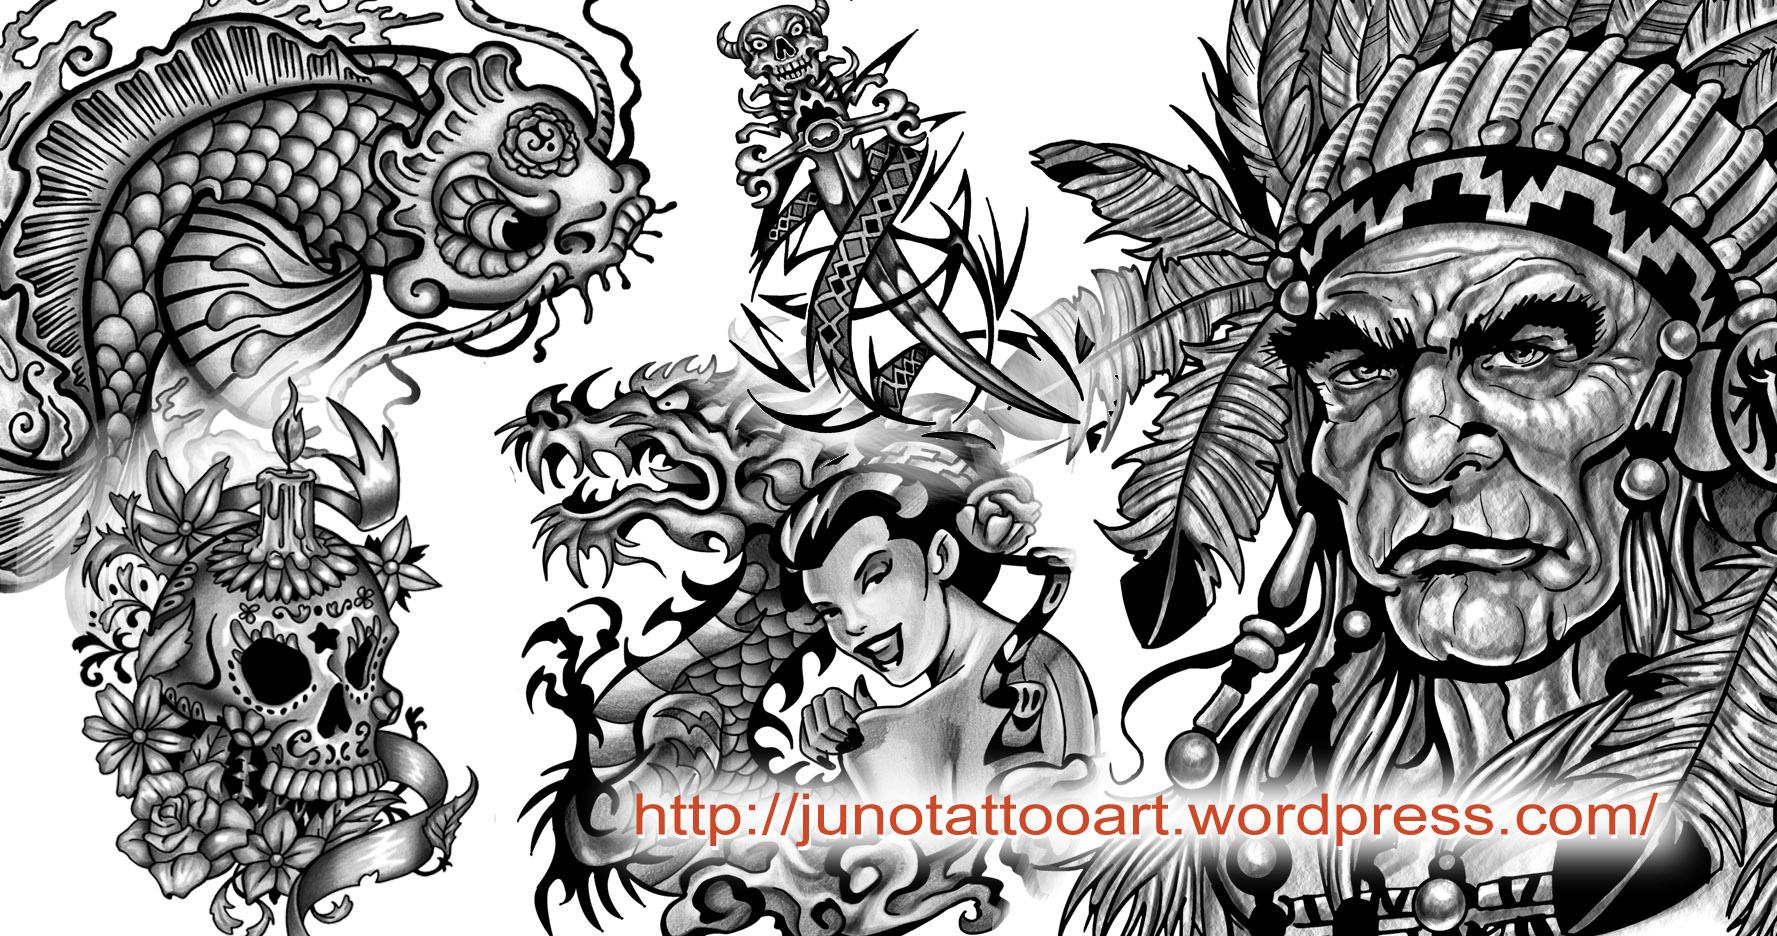 Tatto Crazy Art Ideas: I Want Crazy Art! (1 Users)